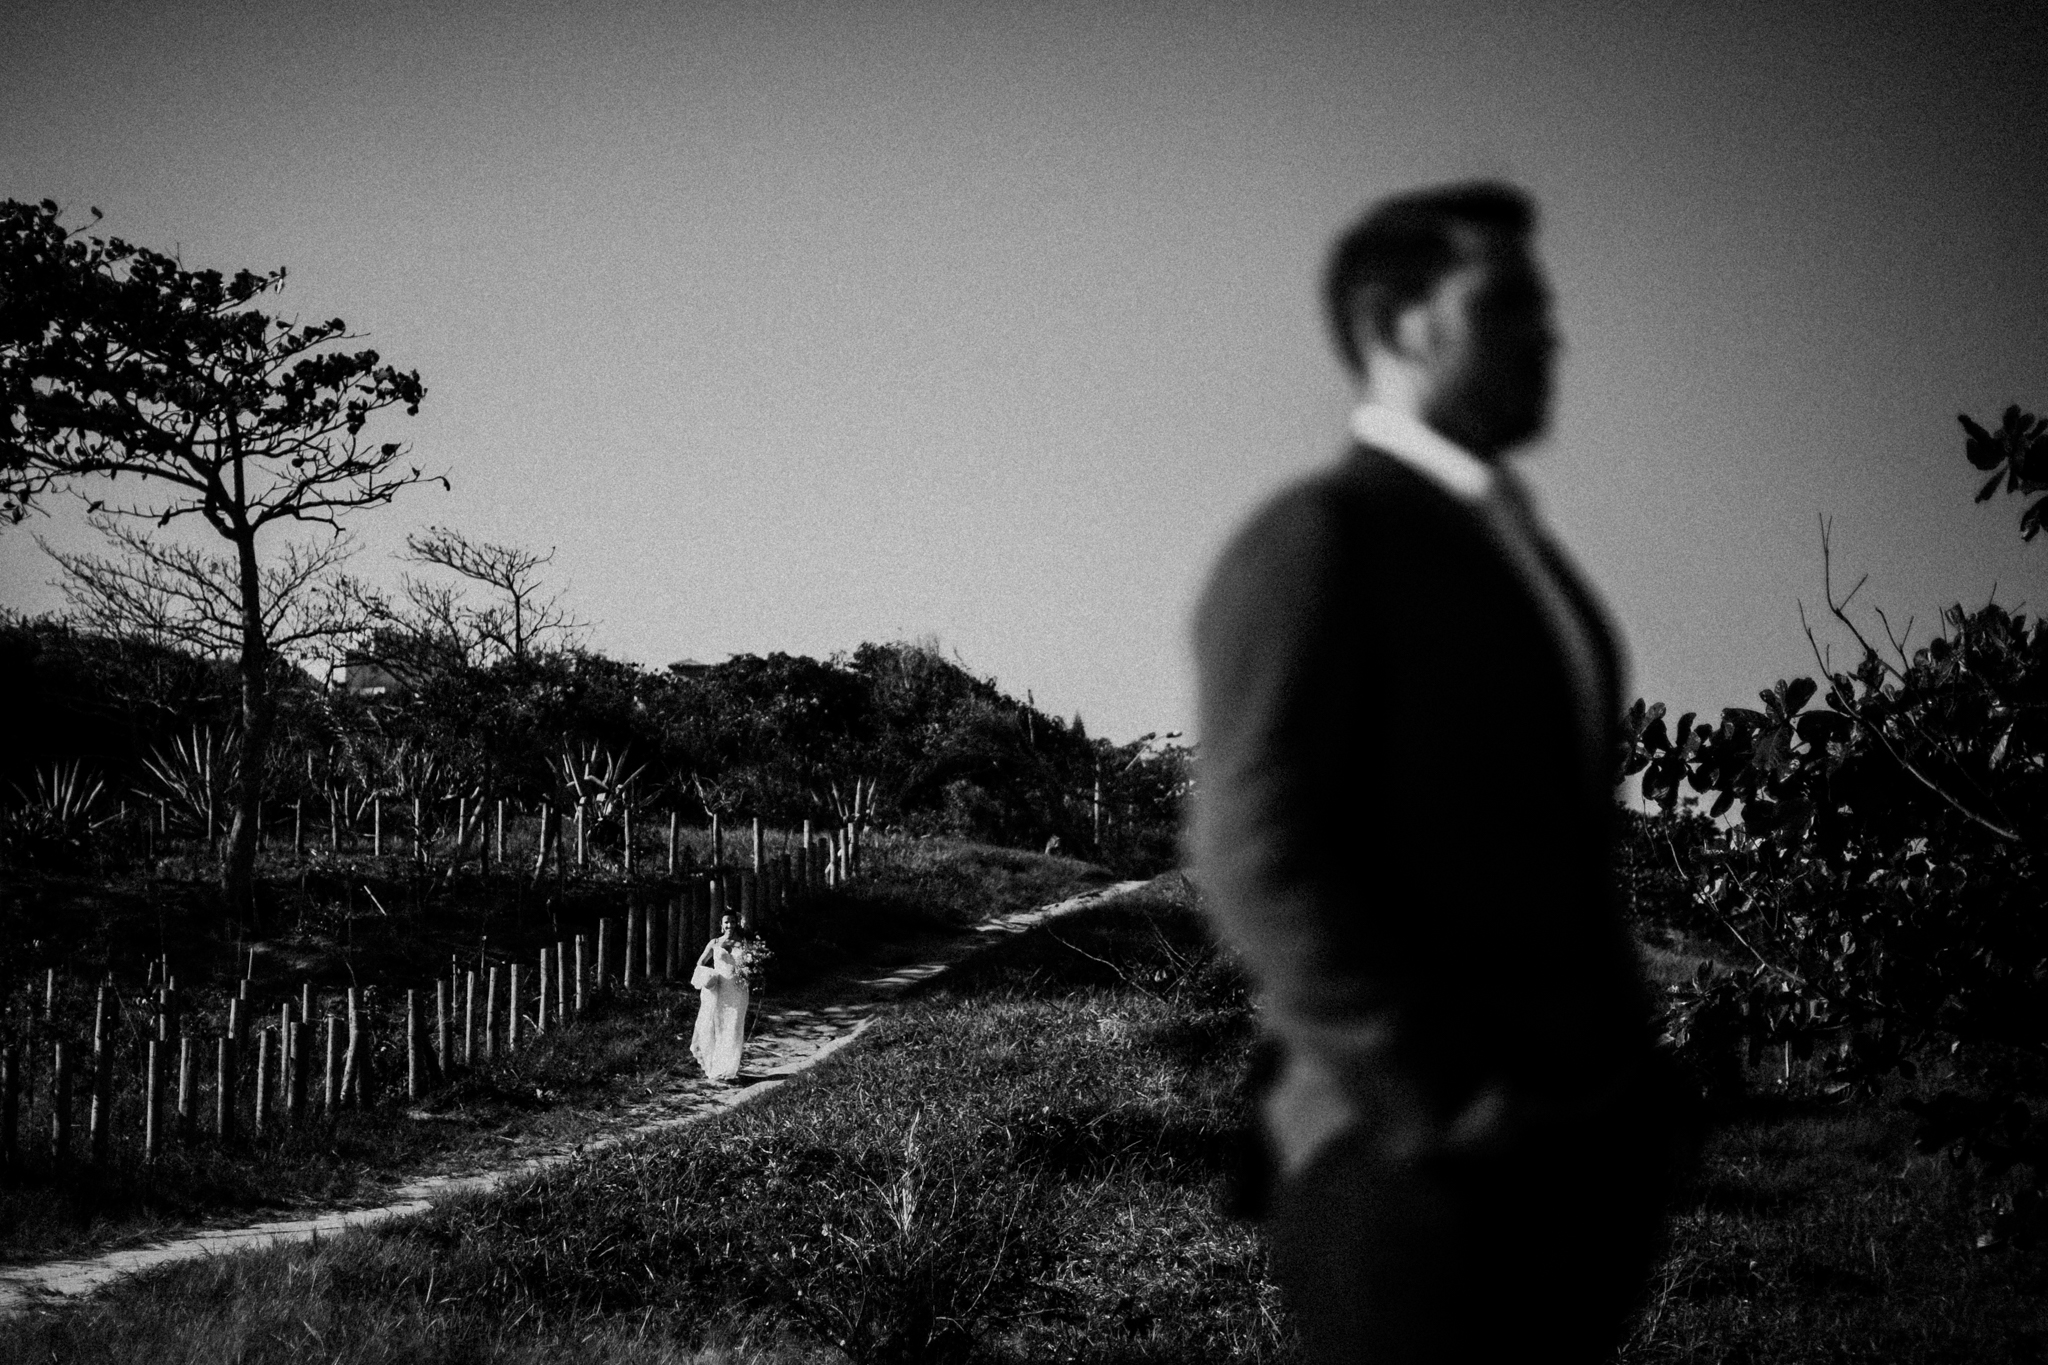 2018.08 Casamento Priscila Barros e Patrizio 0021.jpg